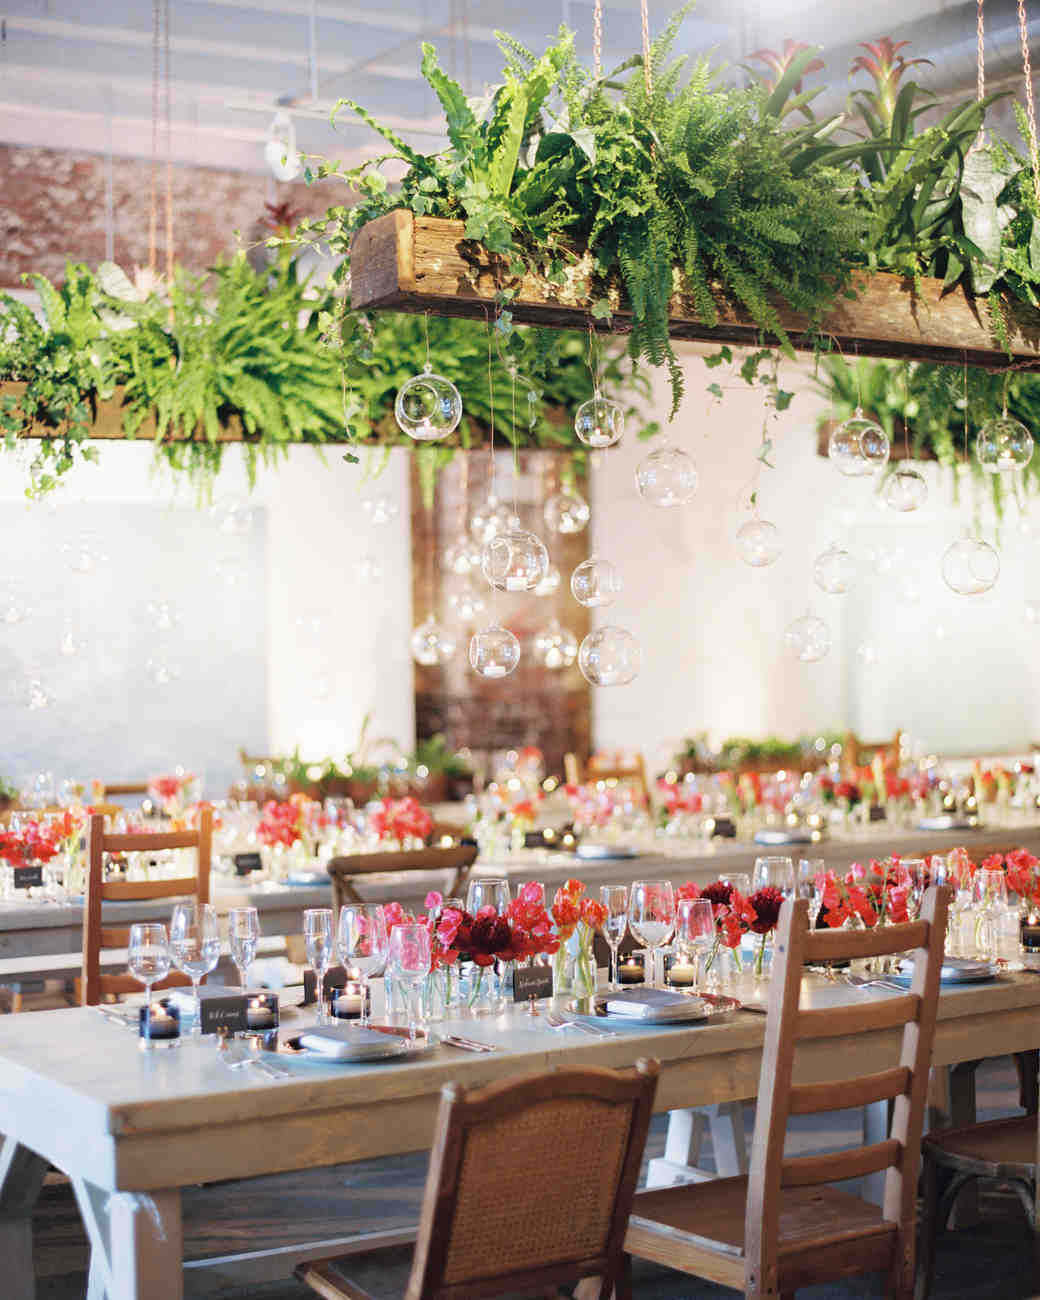 shannon-ryan-wedding-reception-359-s111853-0415.jpg